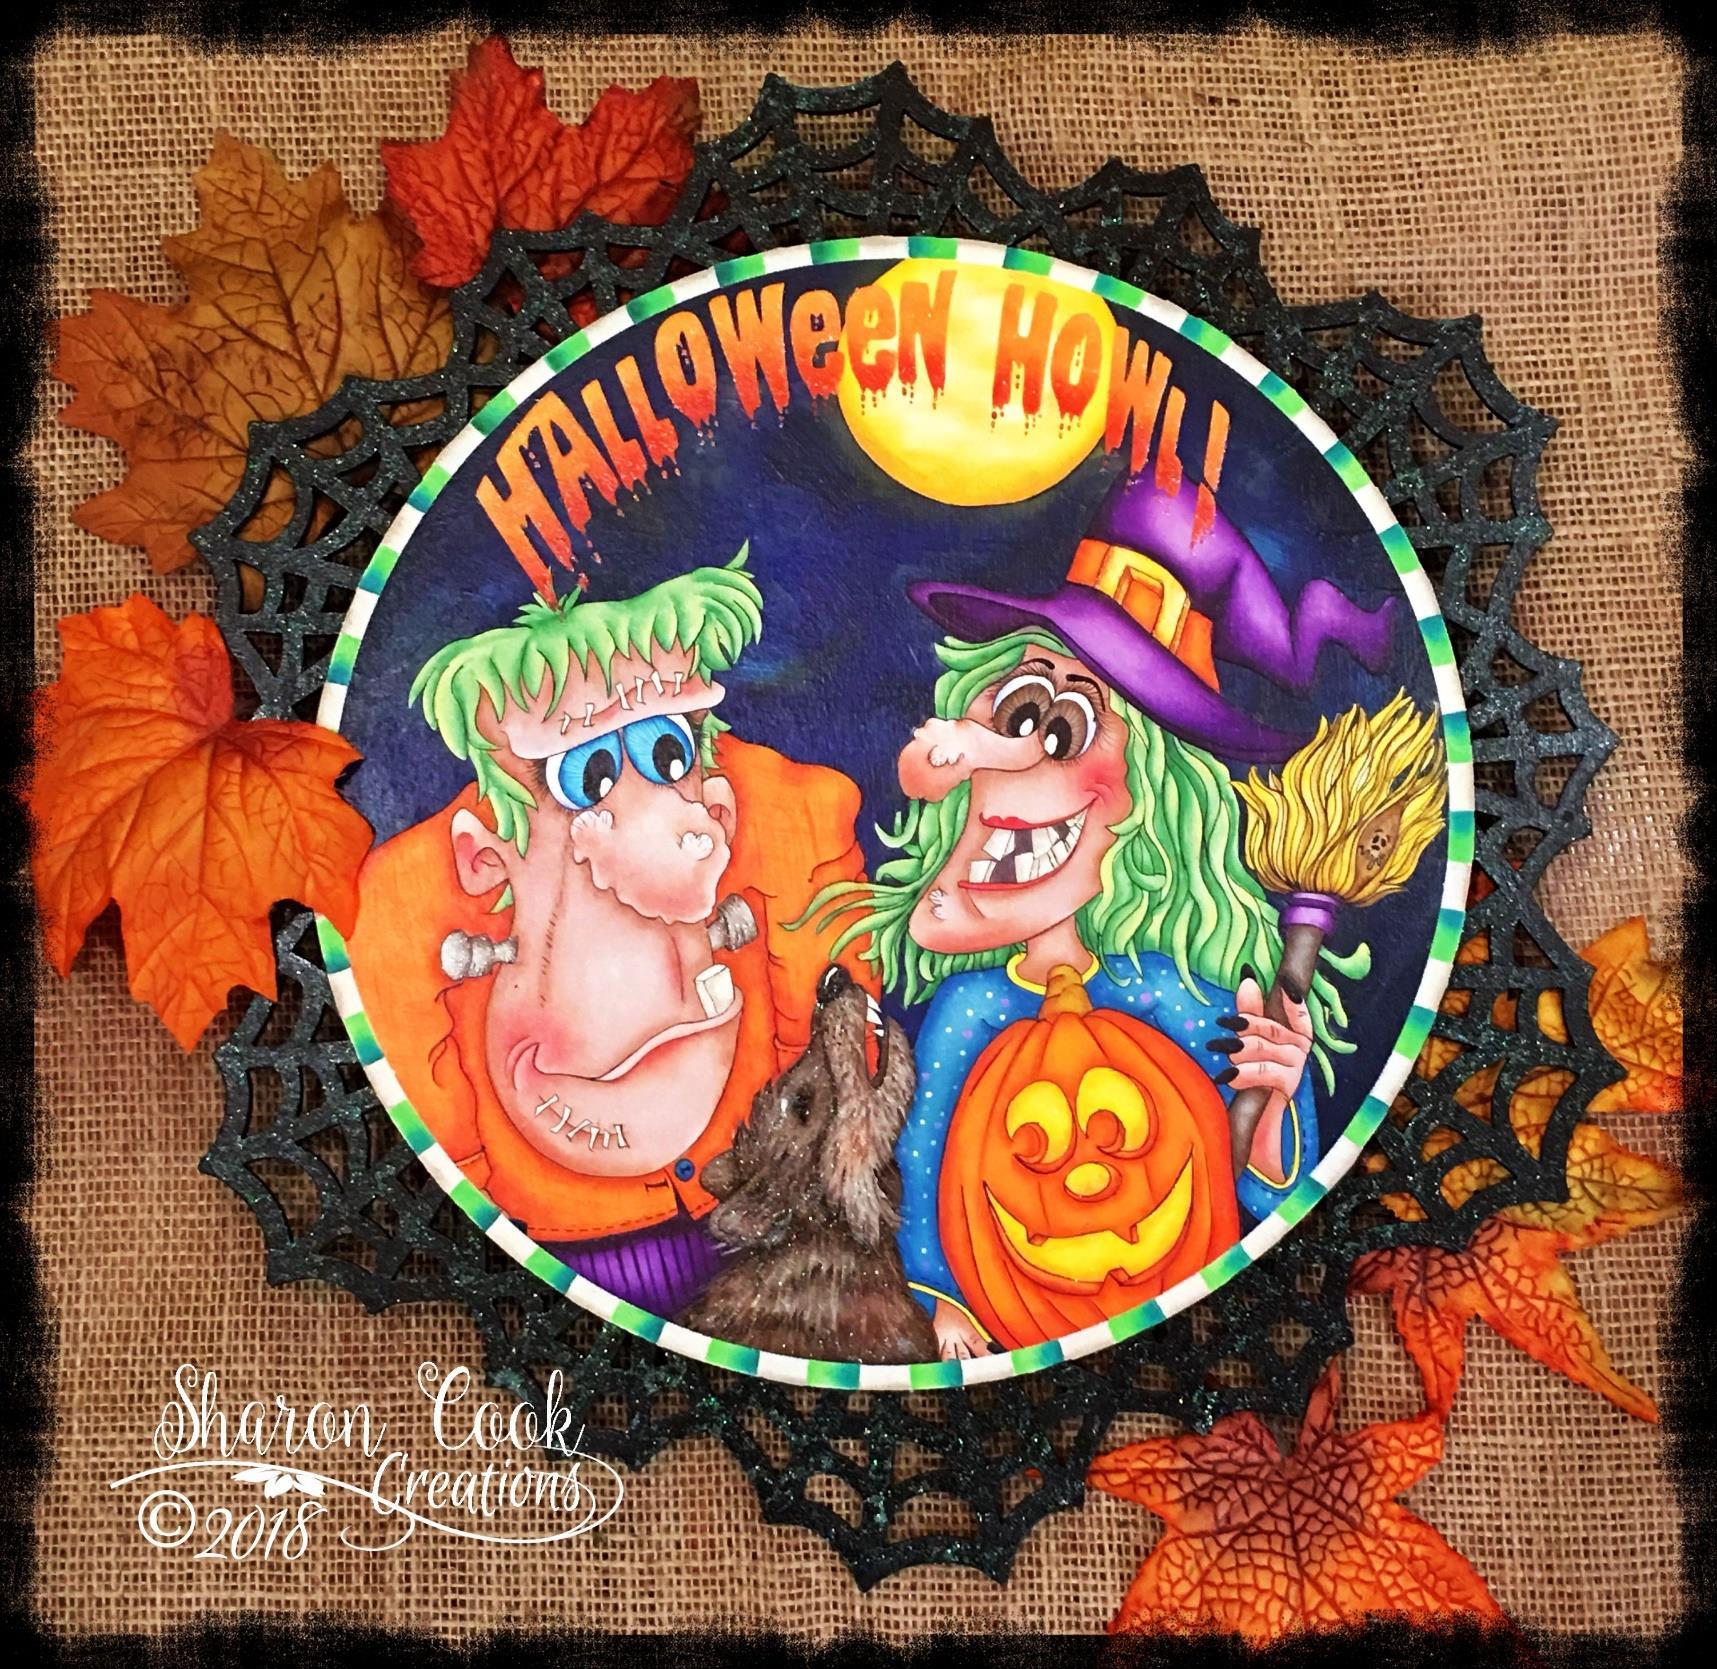 Halloween Howl Lazy Susan - E-Packet - Sharon Cook